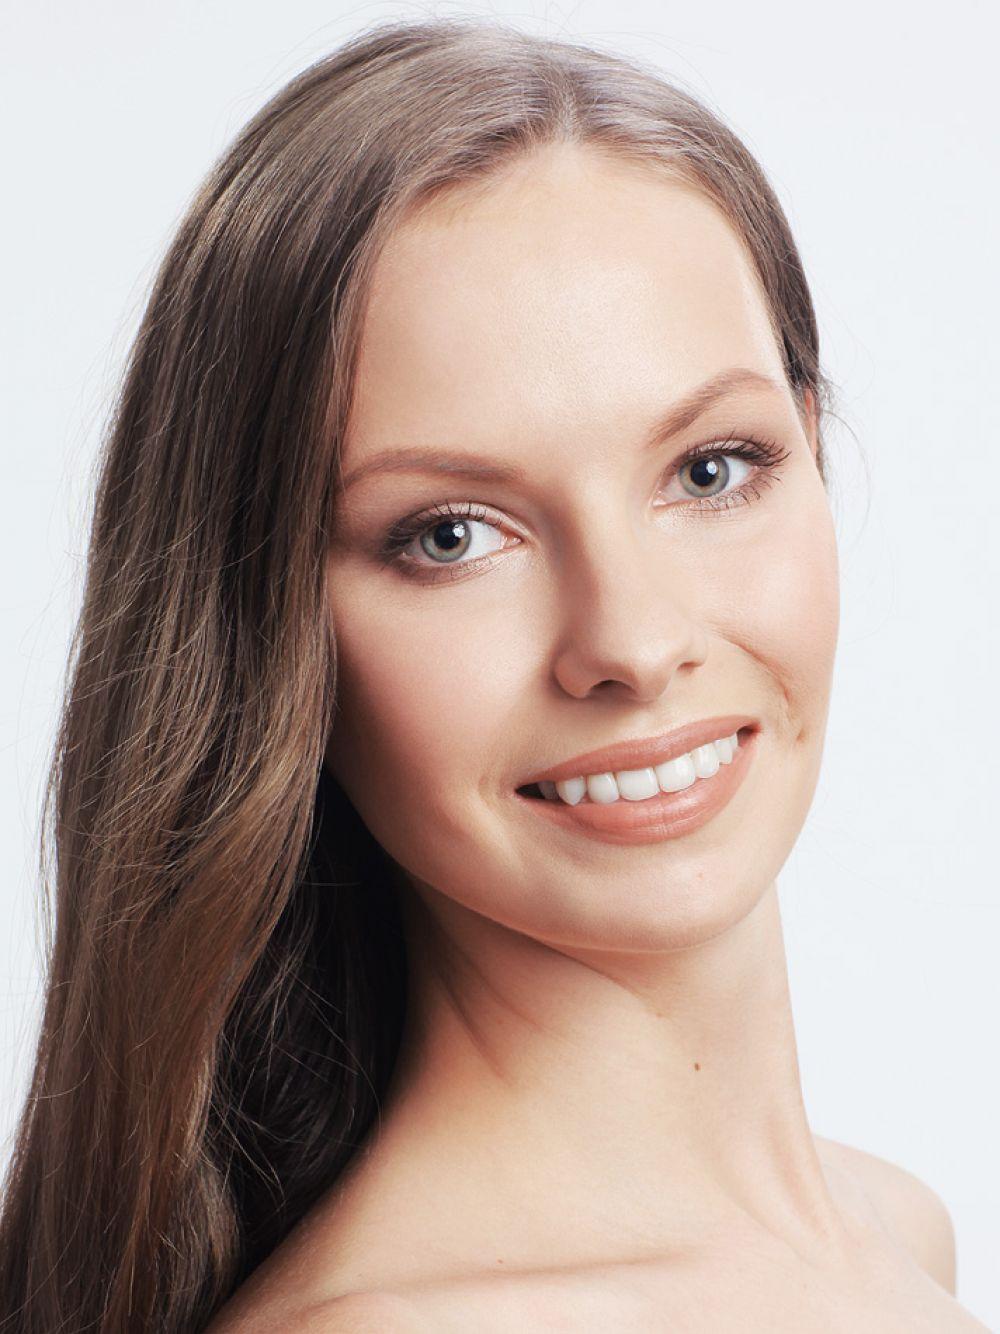 Анна Лагунова, 23 года, 170 см.